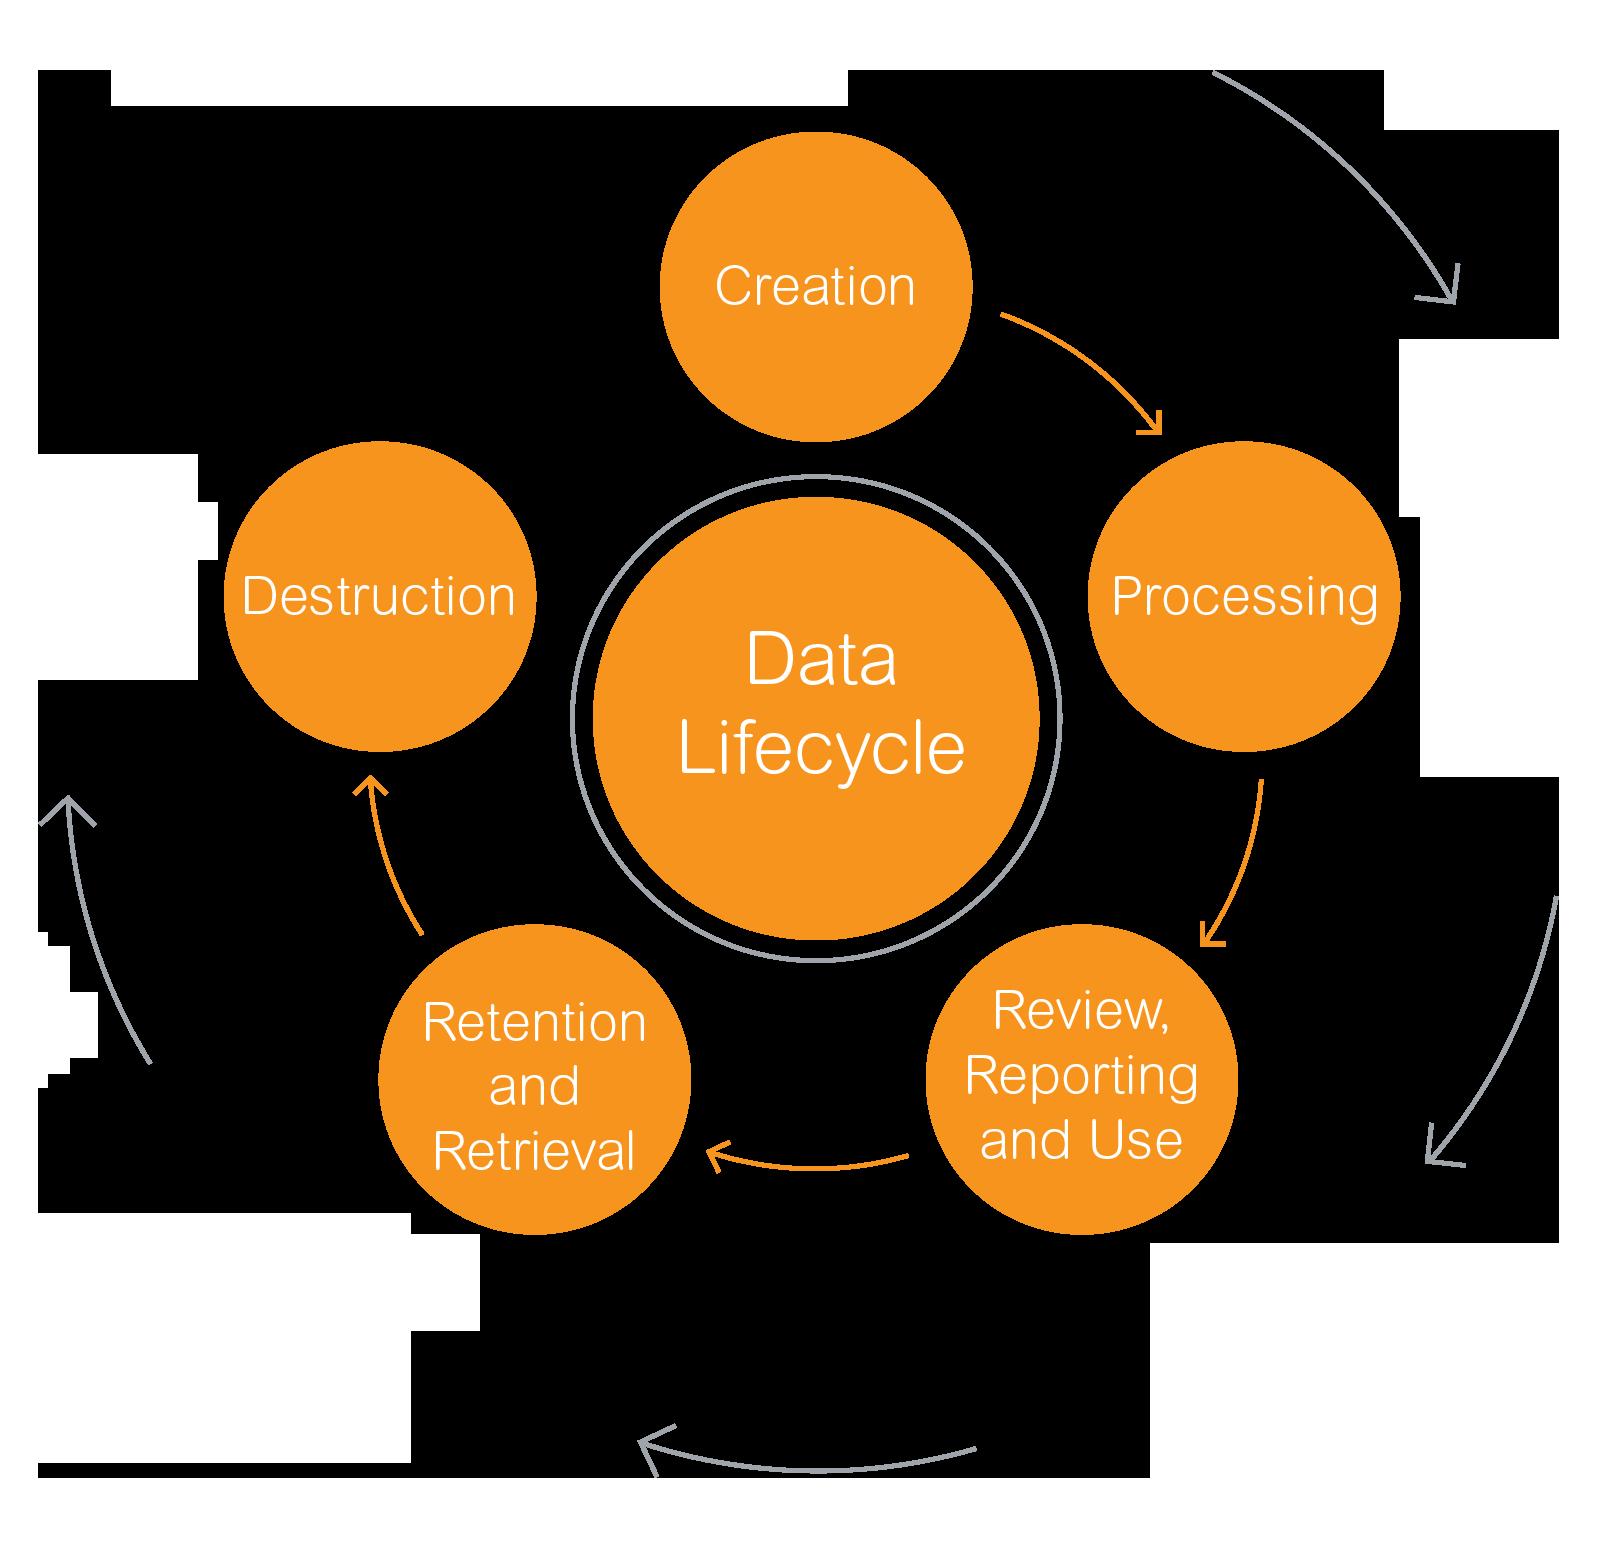 Data life cycle diagram